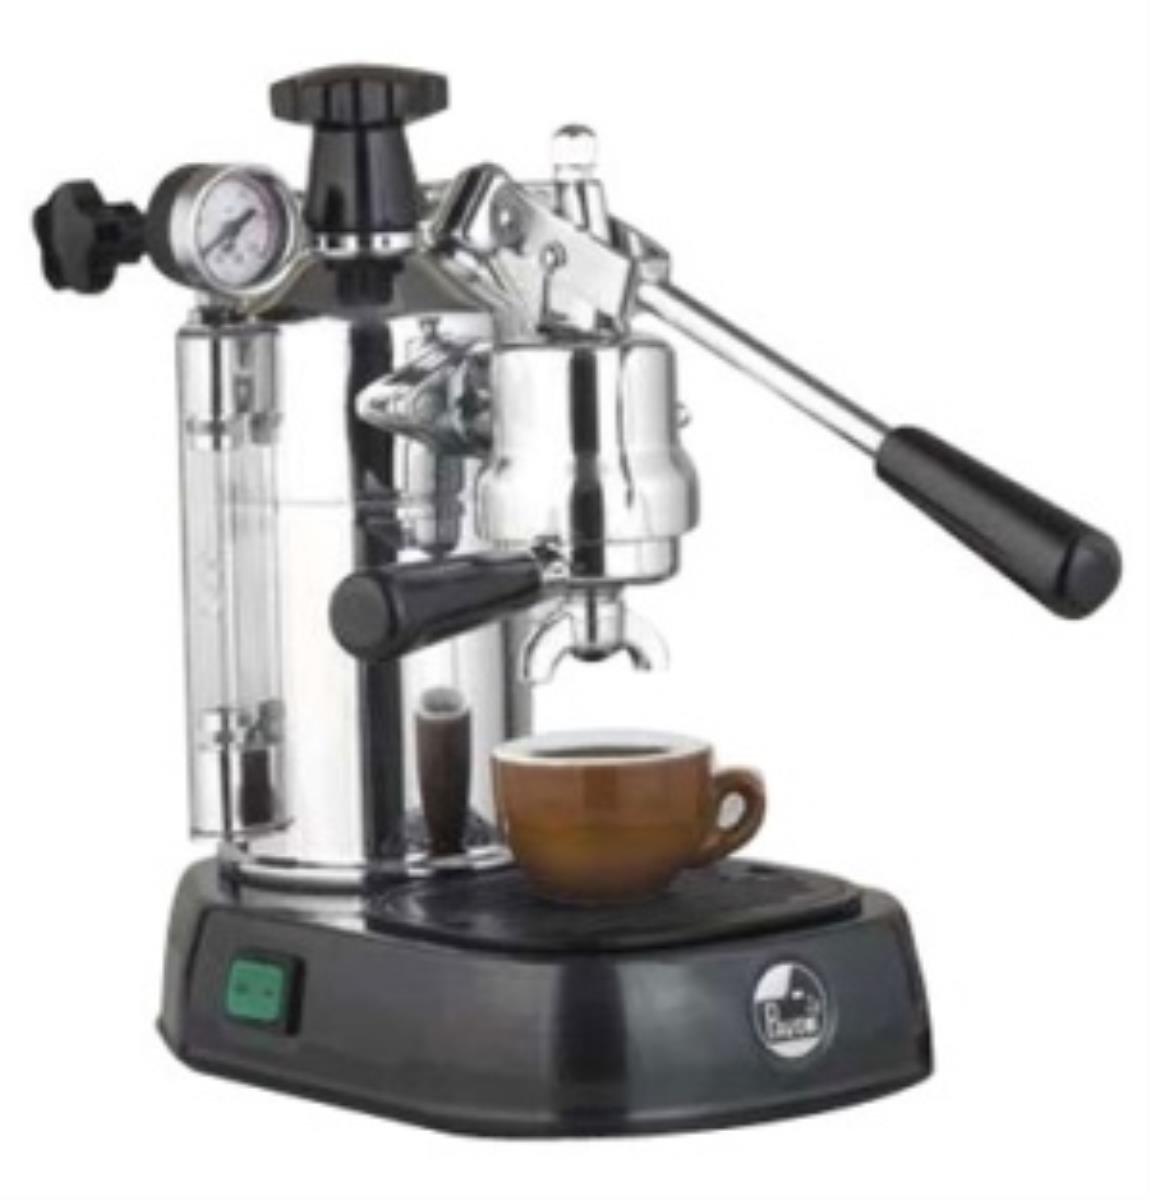 La Pavoni Professional PBB-16 Espresso Machine